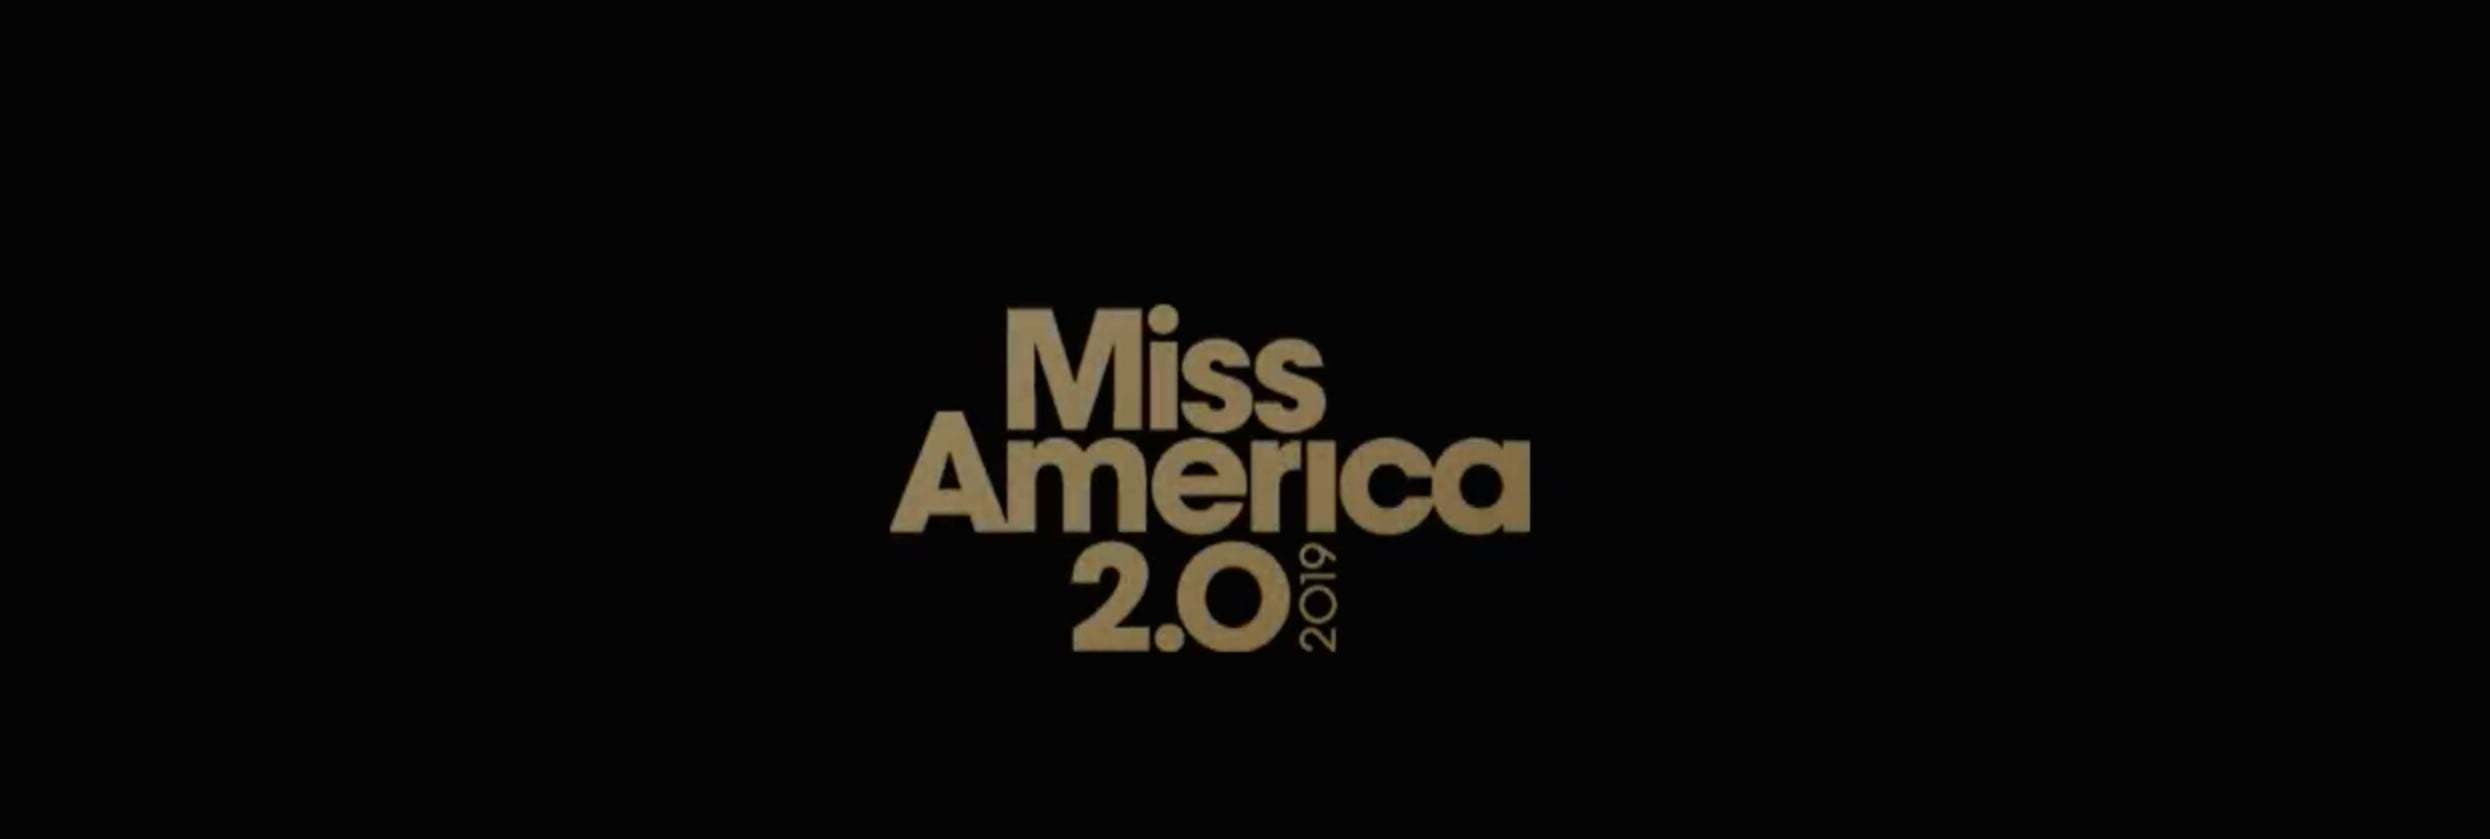 miss america_cannes lions 2018_bigumigu_8